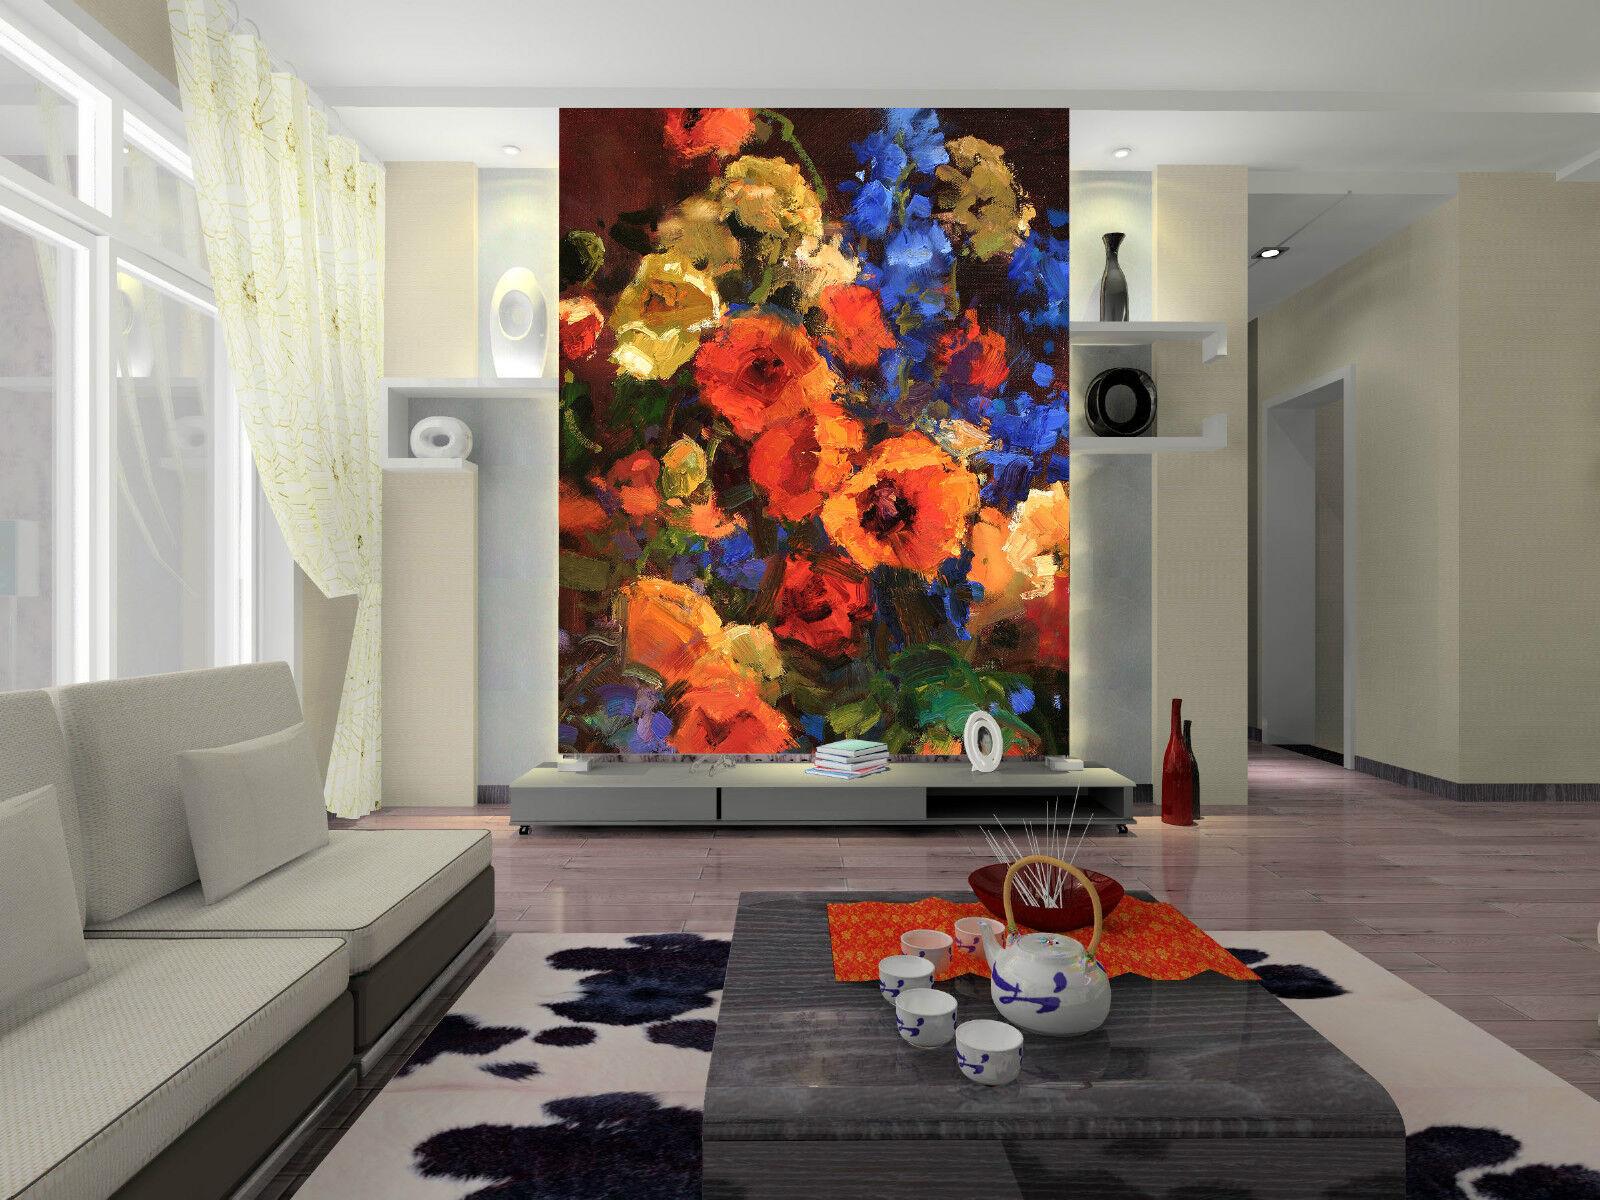 3D Umgeben von bluemen 3667 Fototapeten Wandbild Fototapete BildTapete Familie